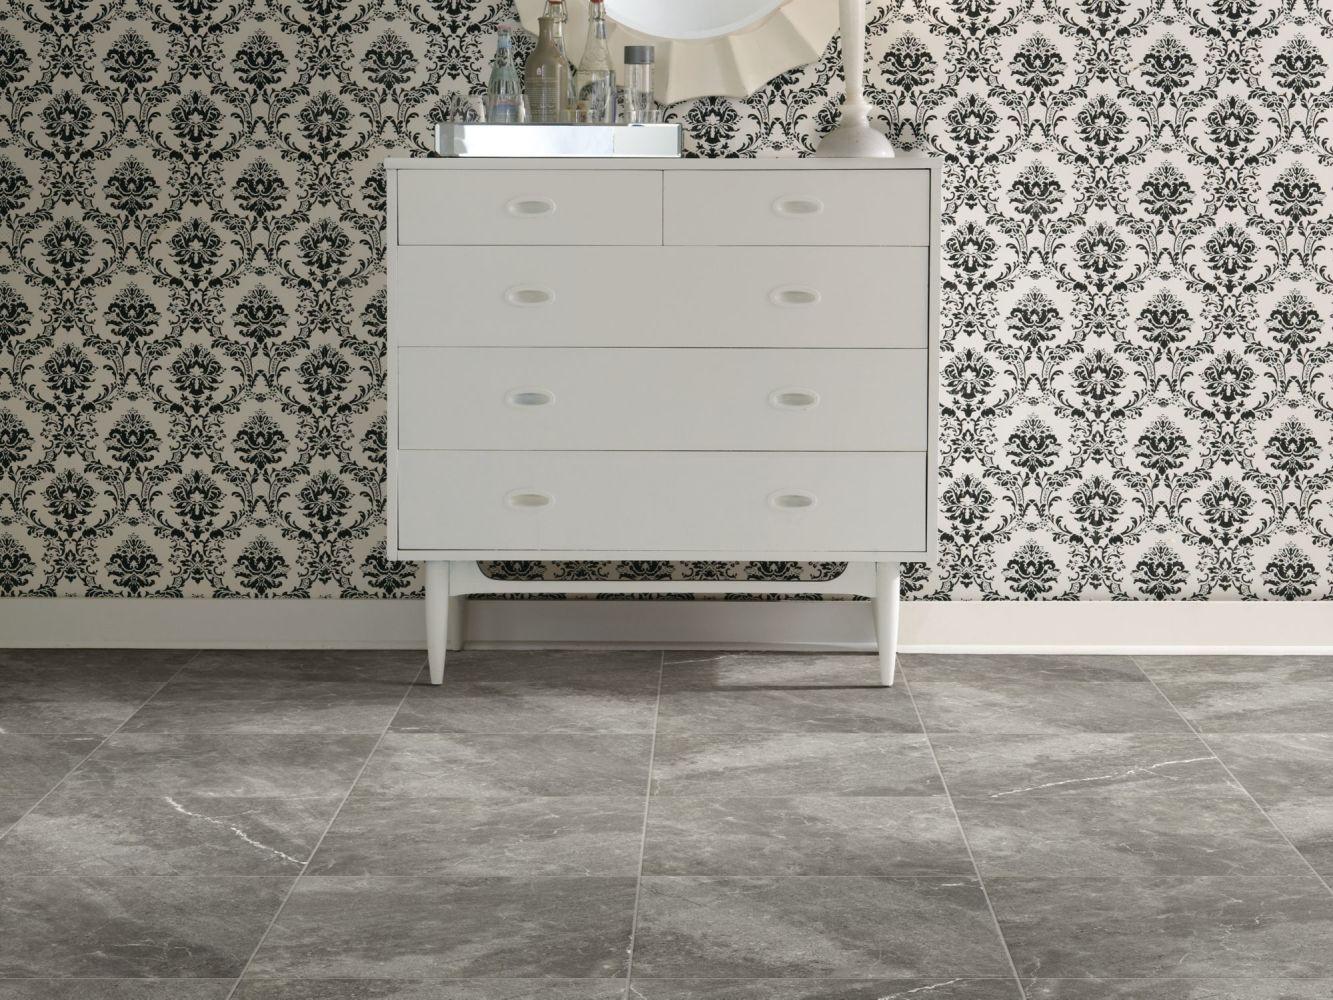 Shaw Floors Home Fn Gold Ceramic Serenity 13 Dark Grey 00570_TGJ88